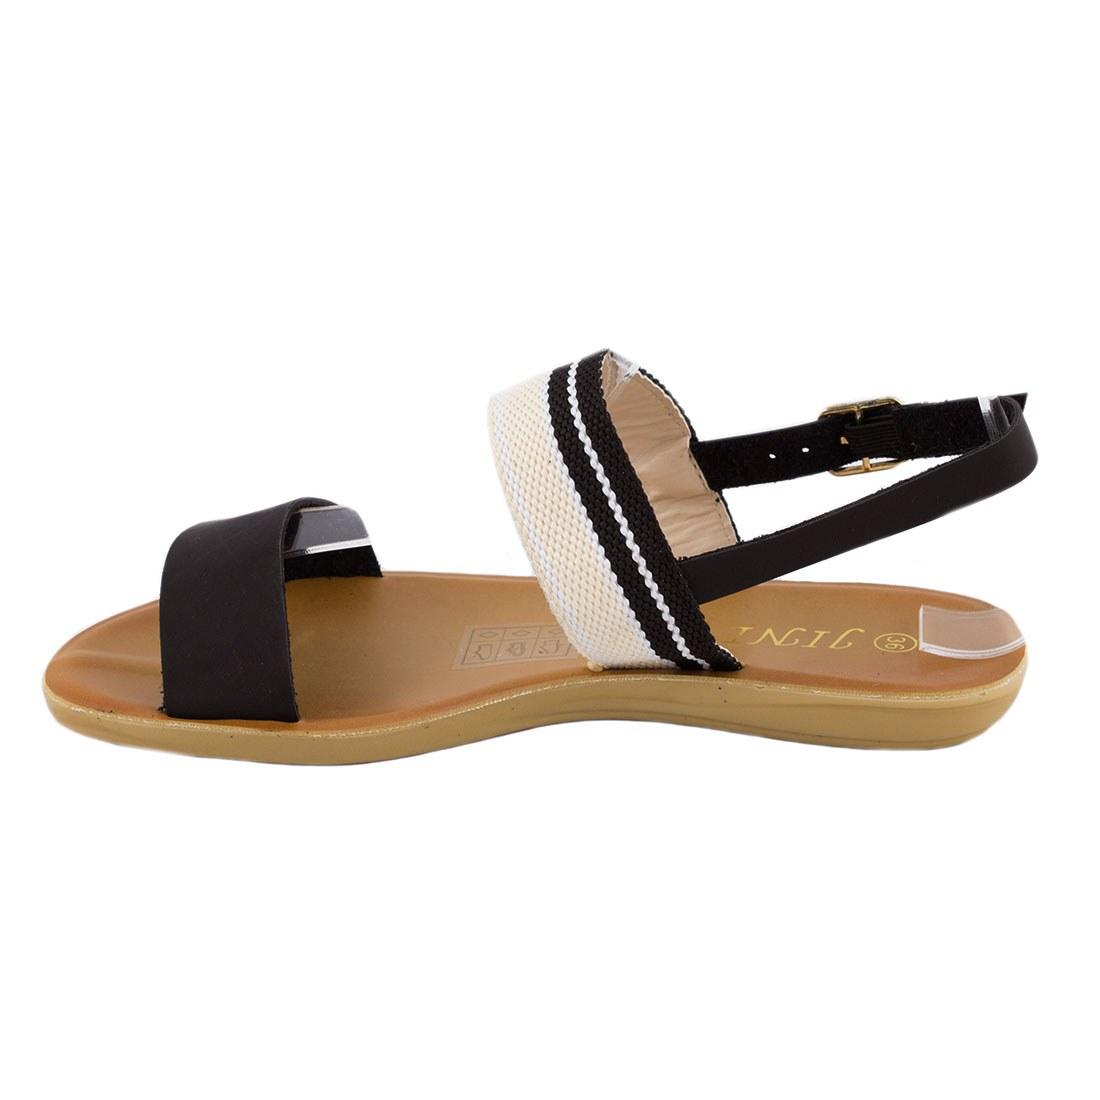 Sandale dama cu barete WS-20184-NEGRU